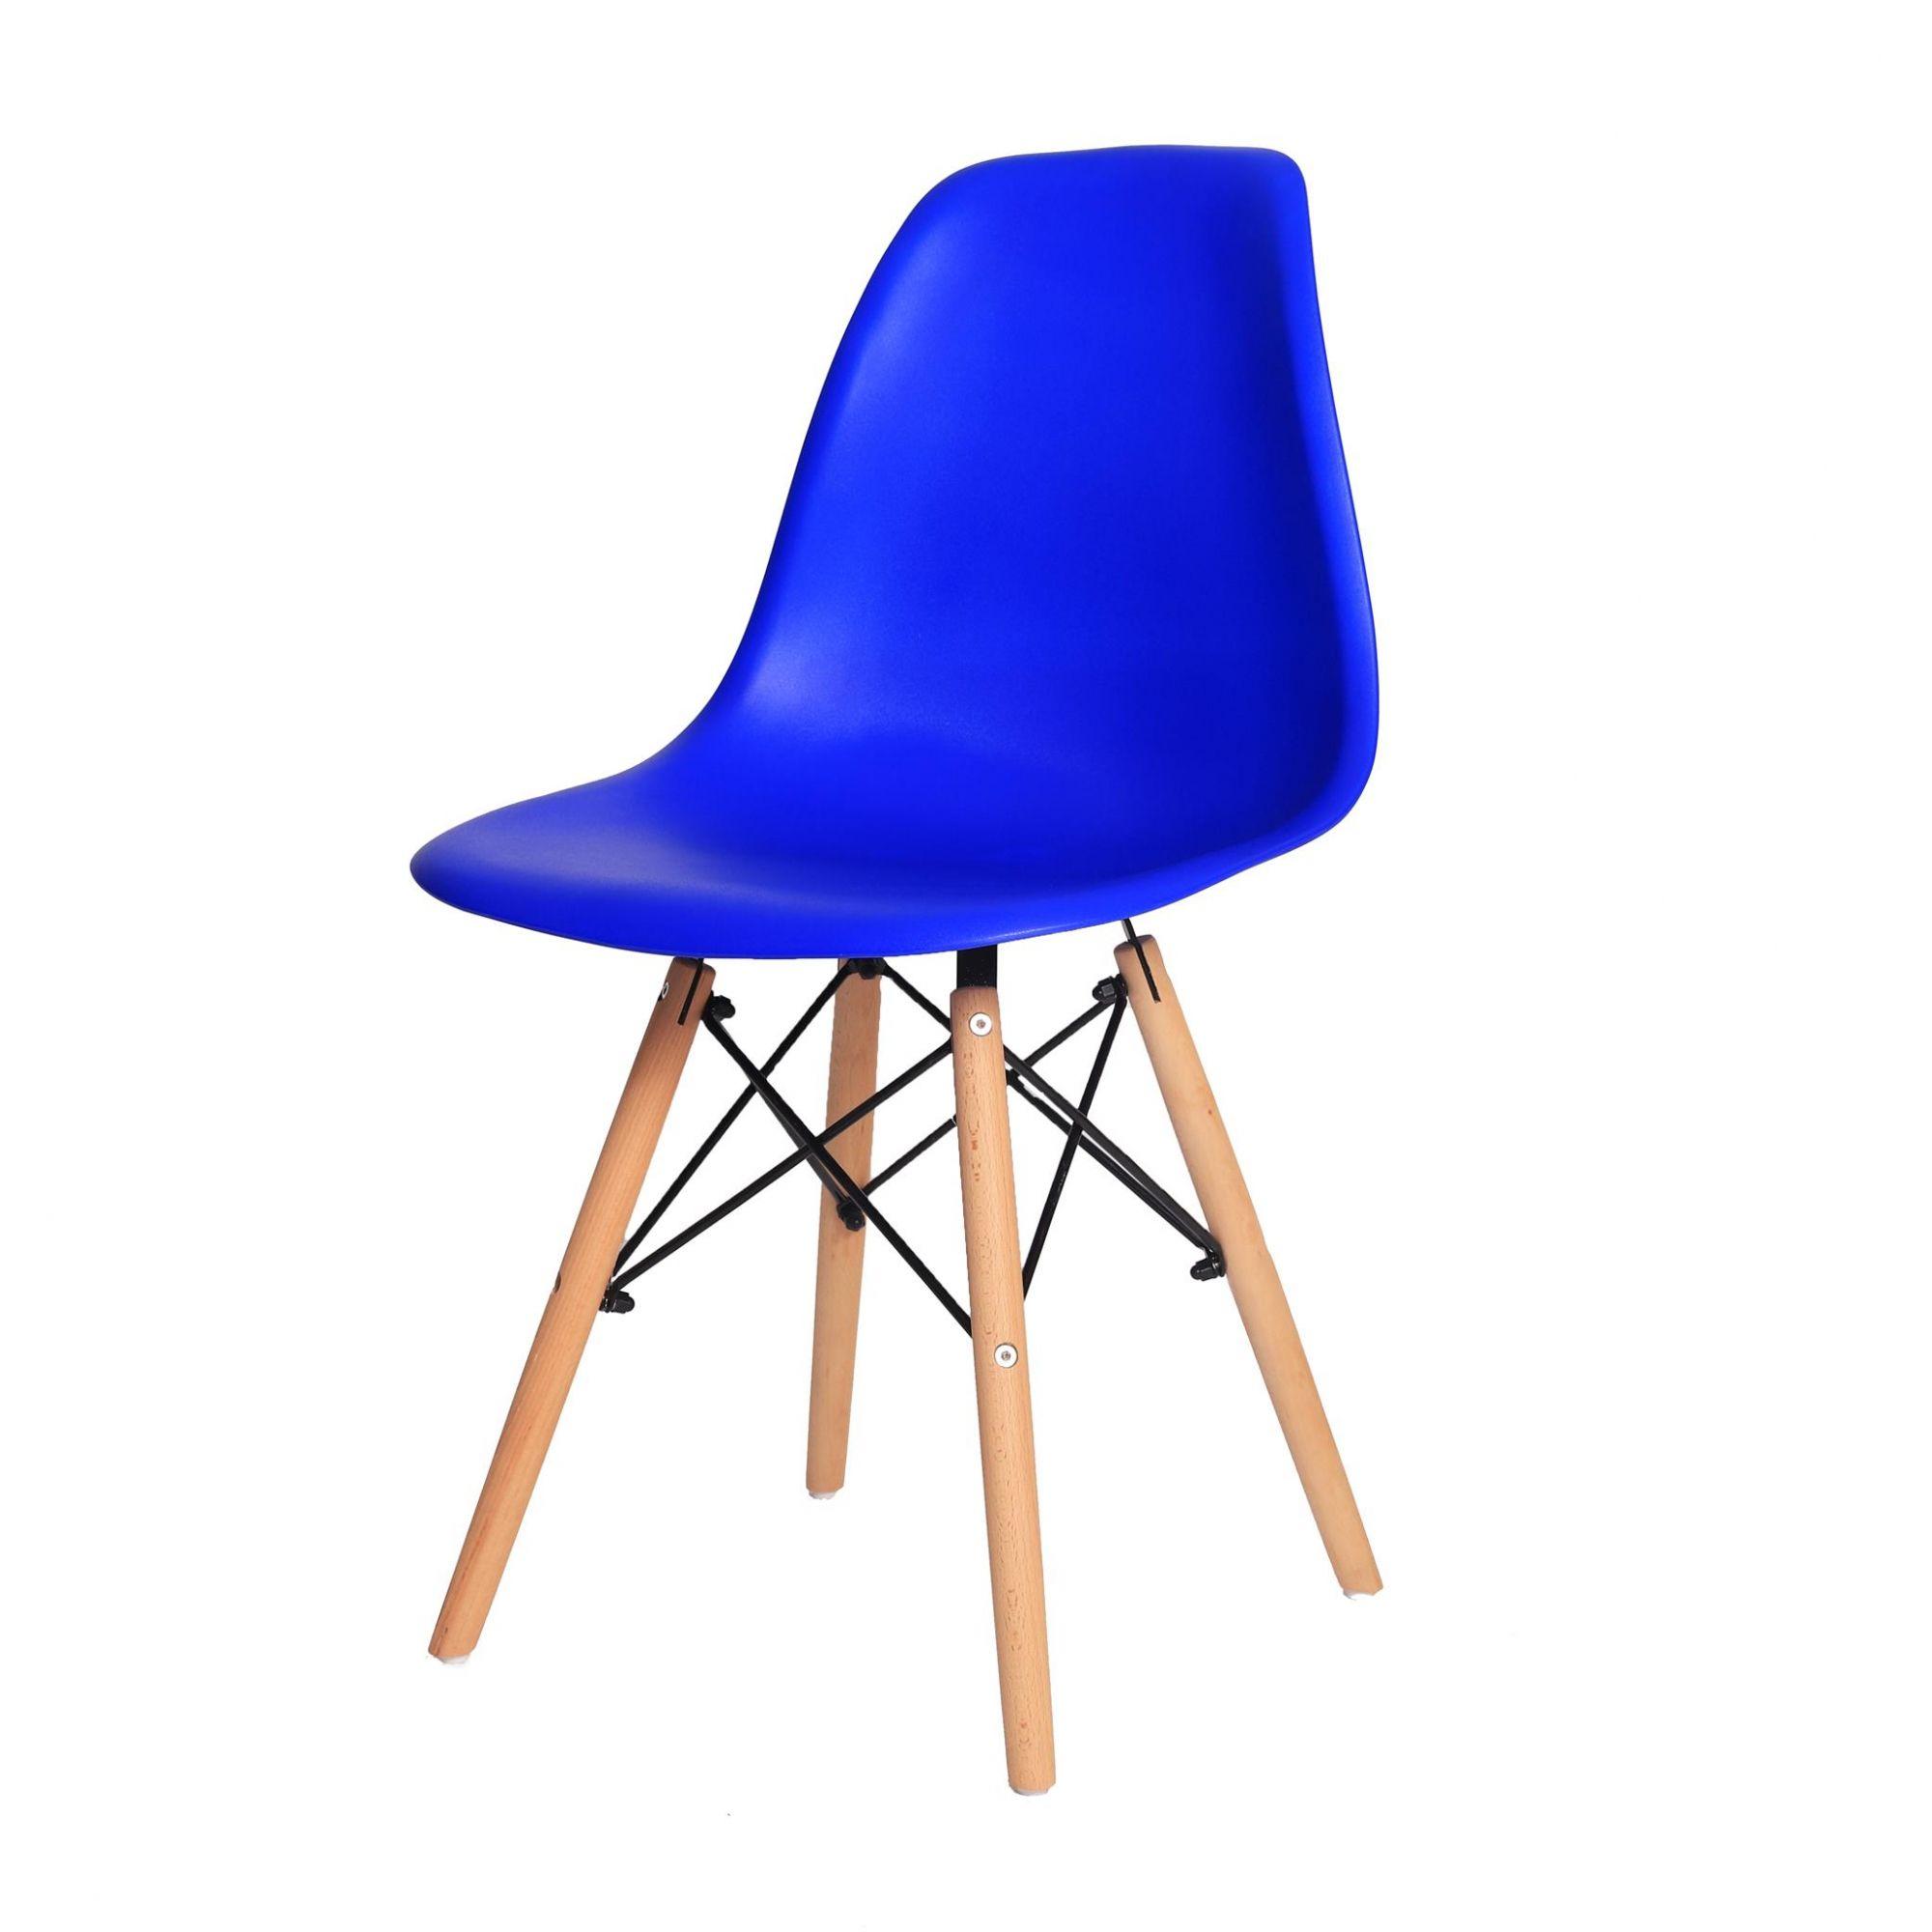 Kit 2 Cadeiras De Jantar Charles Eames Eiffel Azul Bic Base De Madeira